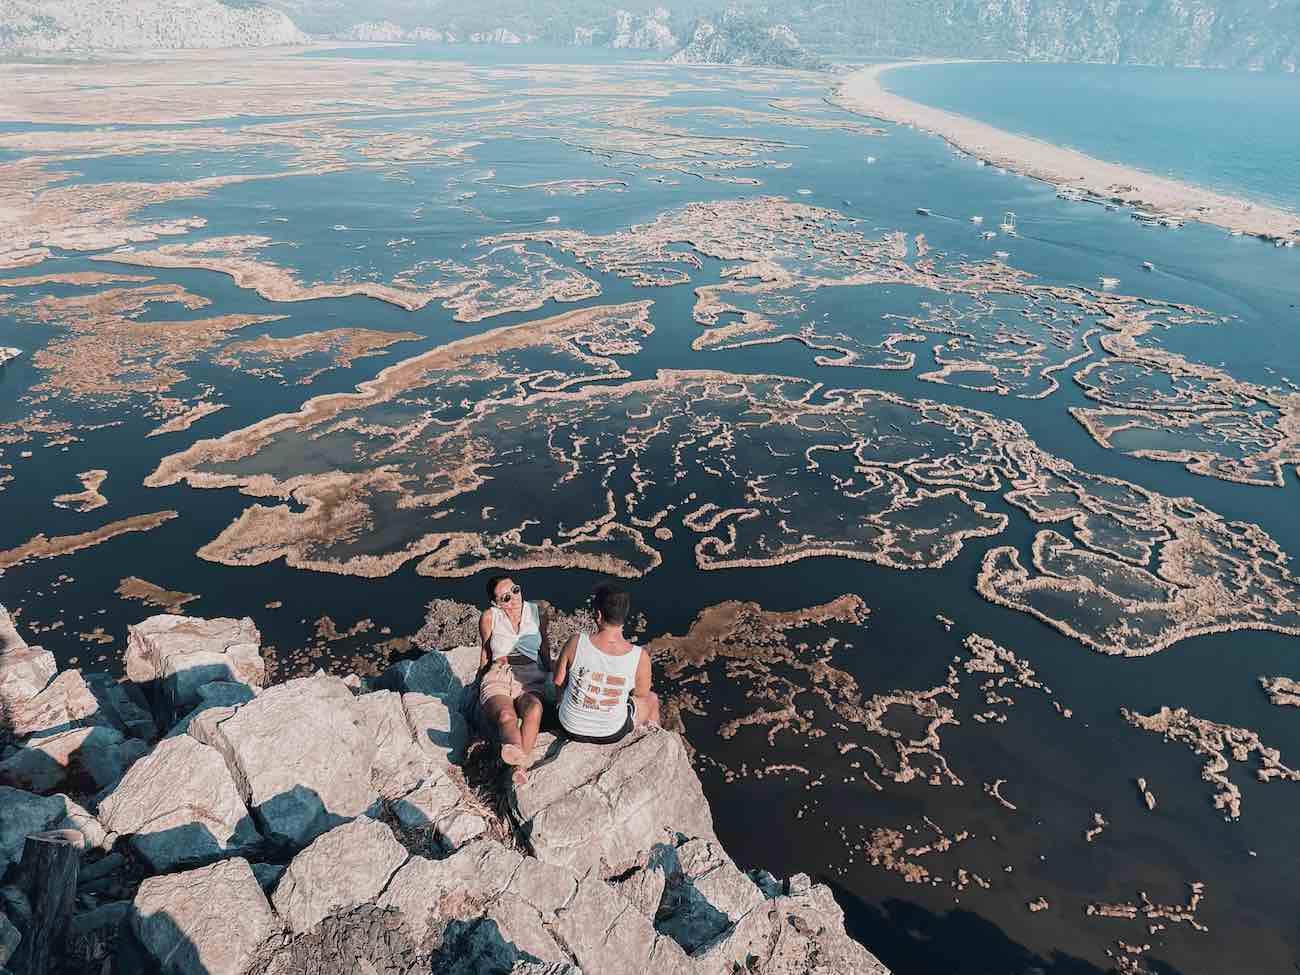 dalyan manzara dalyan deltası